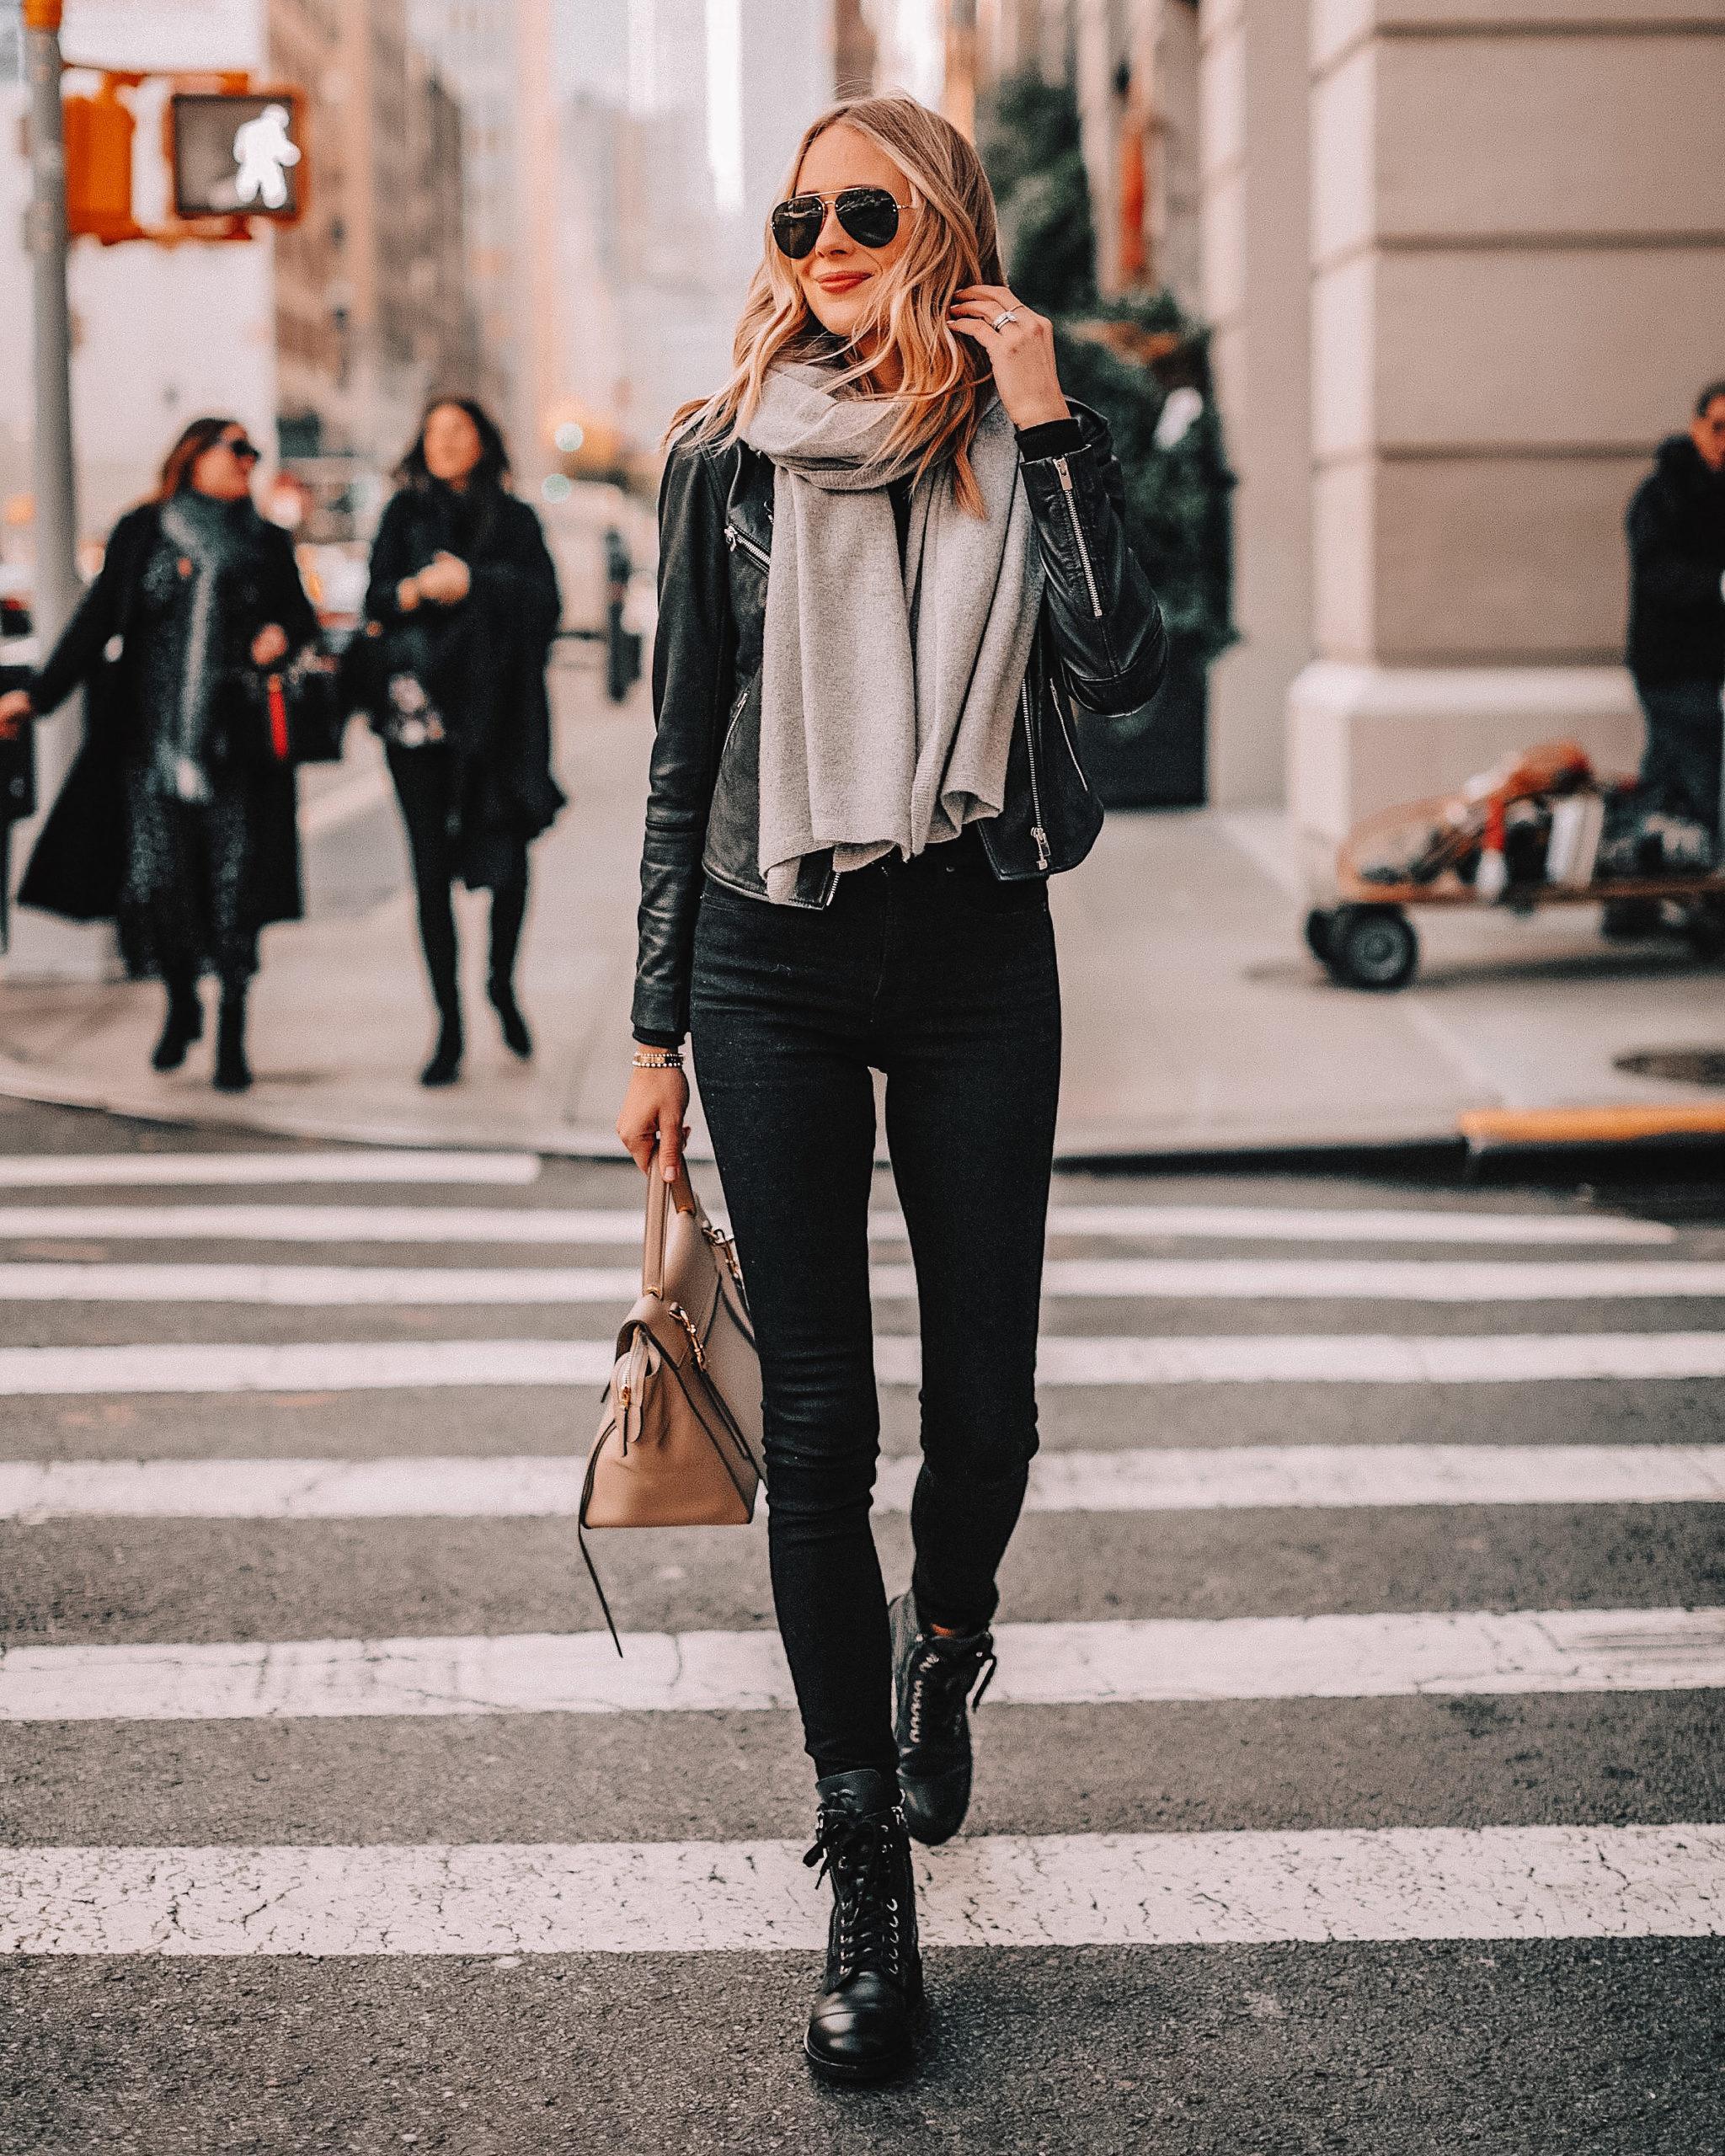 Fashion Jackson Wearing Black Leather Jacket Grey Scarf Black Jeans Black Combat Boots Grey Scarf NYC